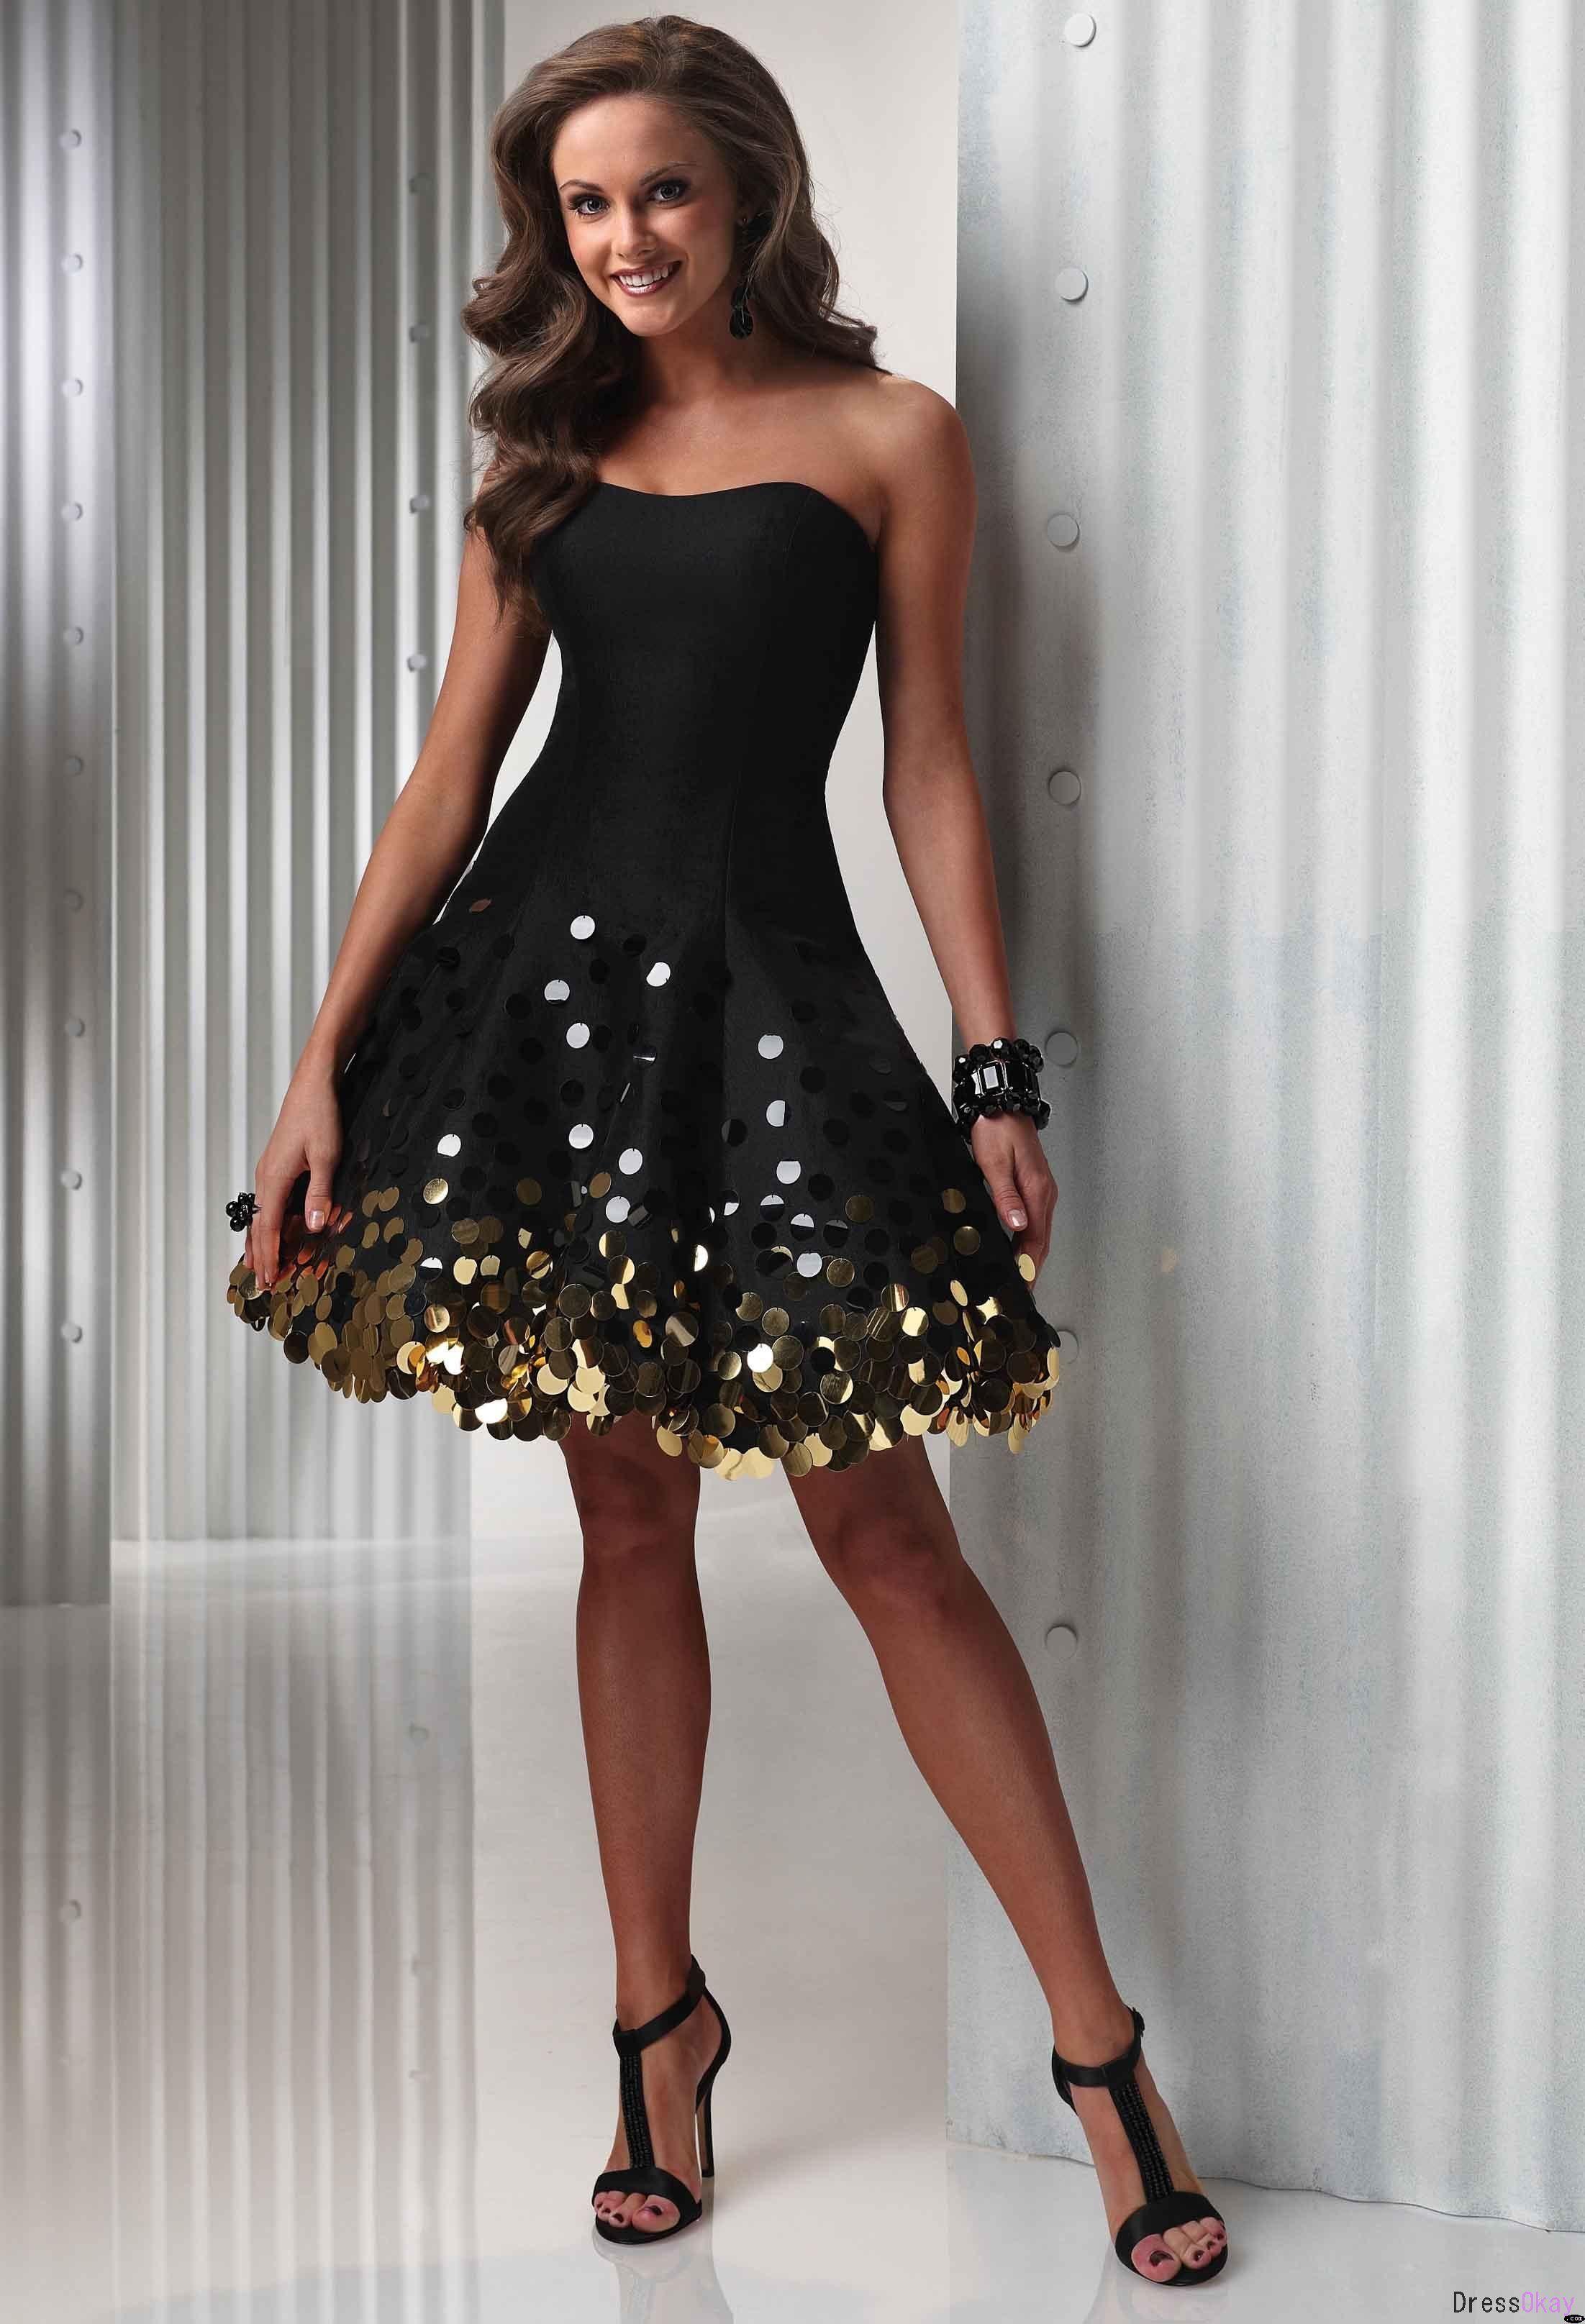 Junior prom dresseswholesale junior prom dressesdesigners junior